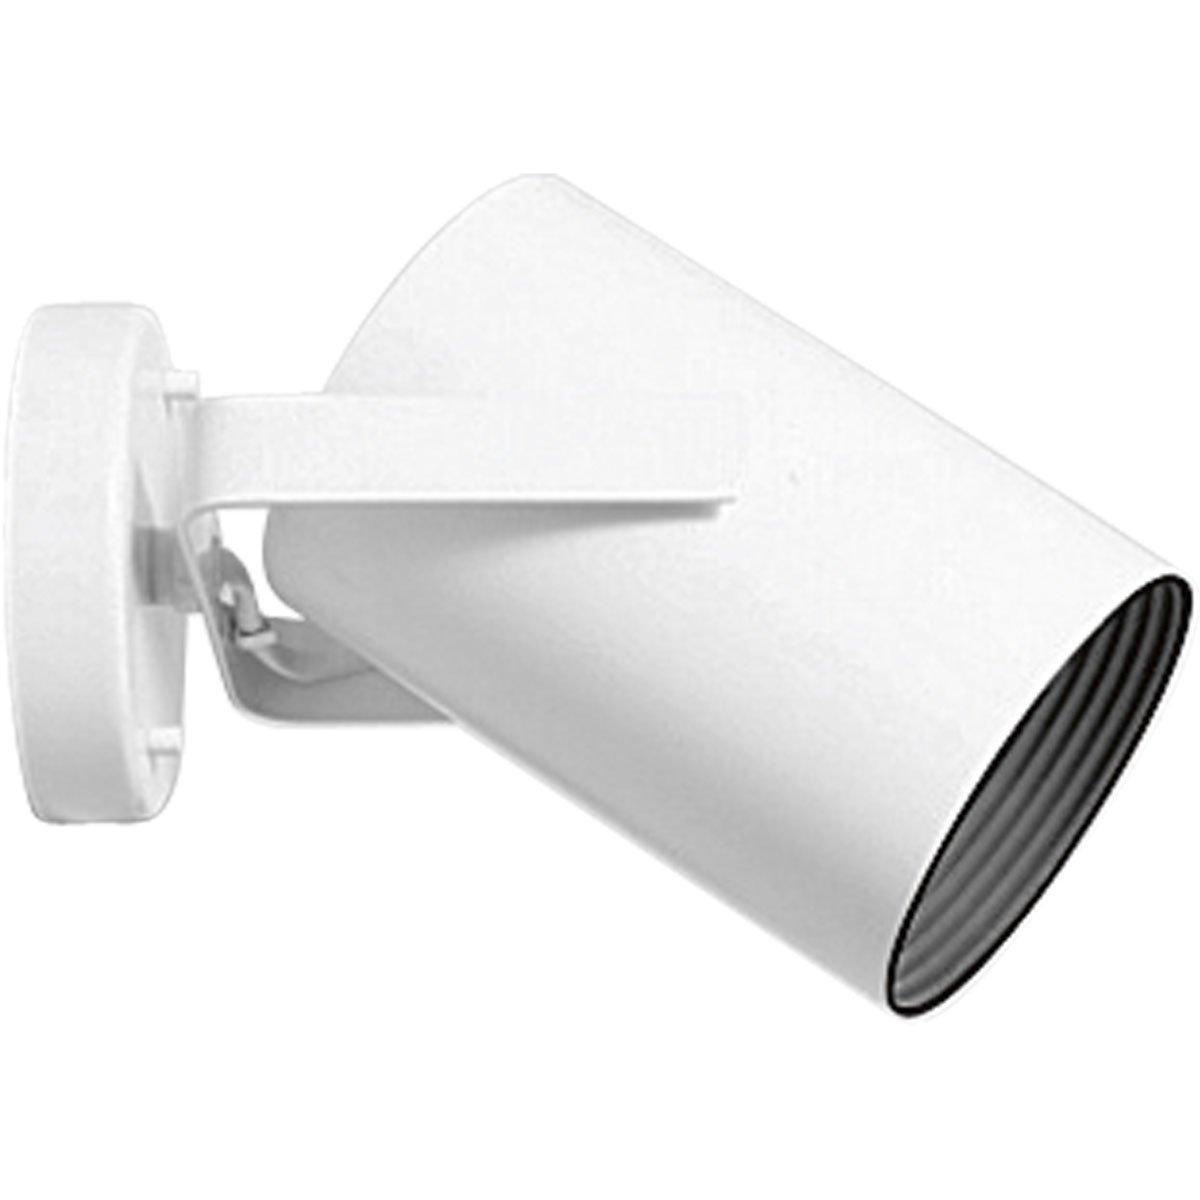 amazoncom progress lighting p6398 30 adjustable wall or ceiling cylinder with black baffle white home improvement adjustable lighting fixtures